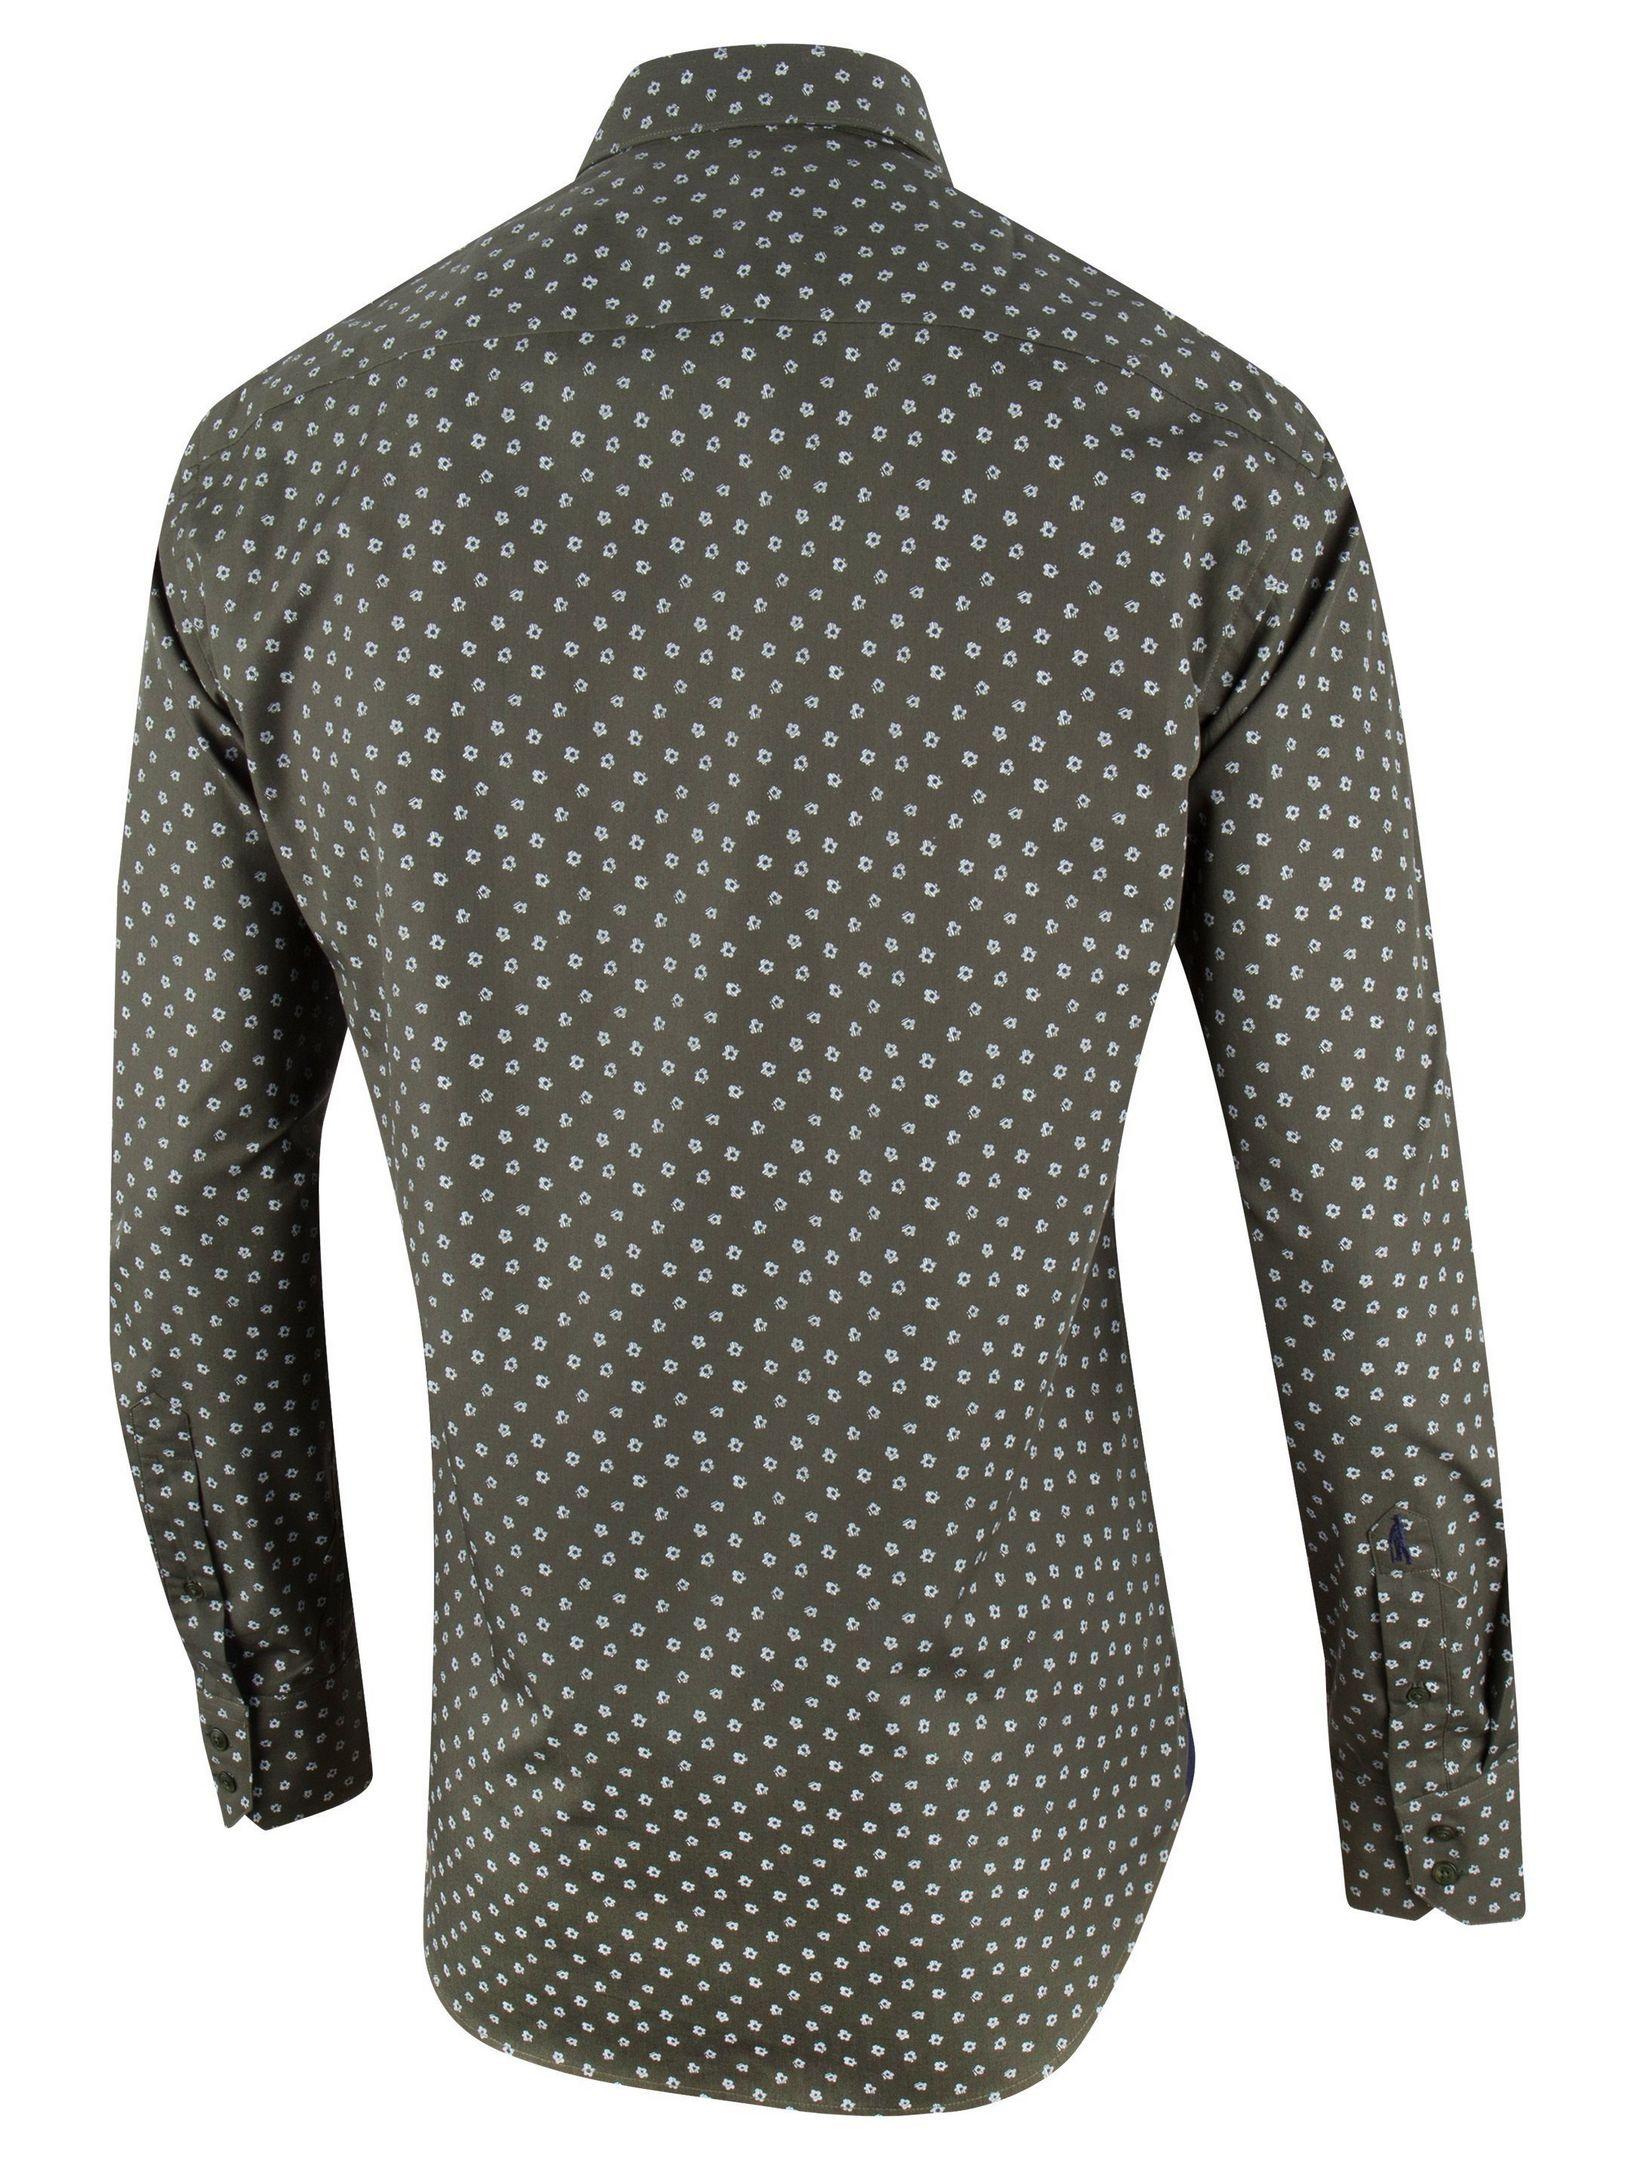 Donkergroen Overhemd.Cavallaro Napoli Tino Overhemd In Kleur Donkergroen Navy Jan